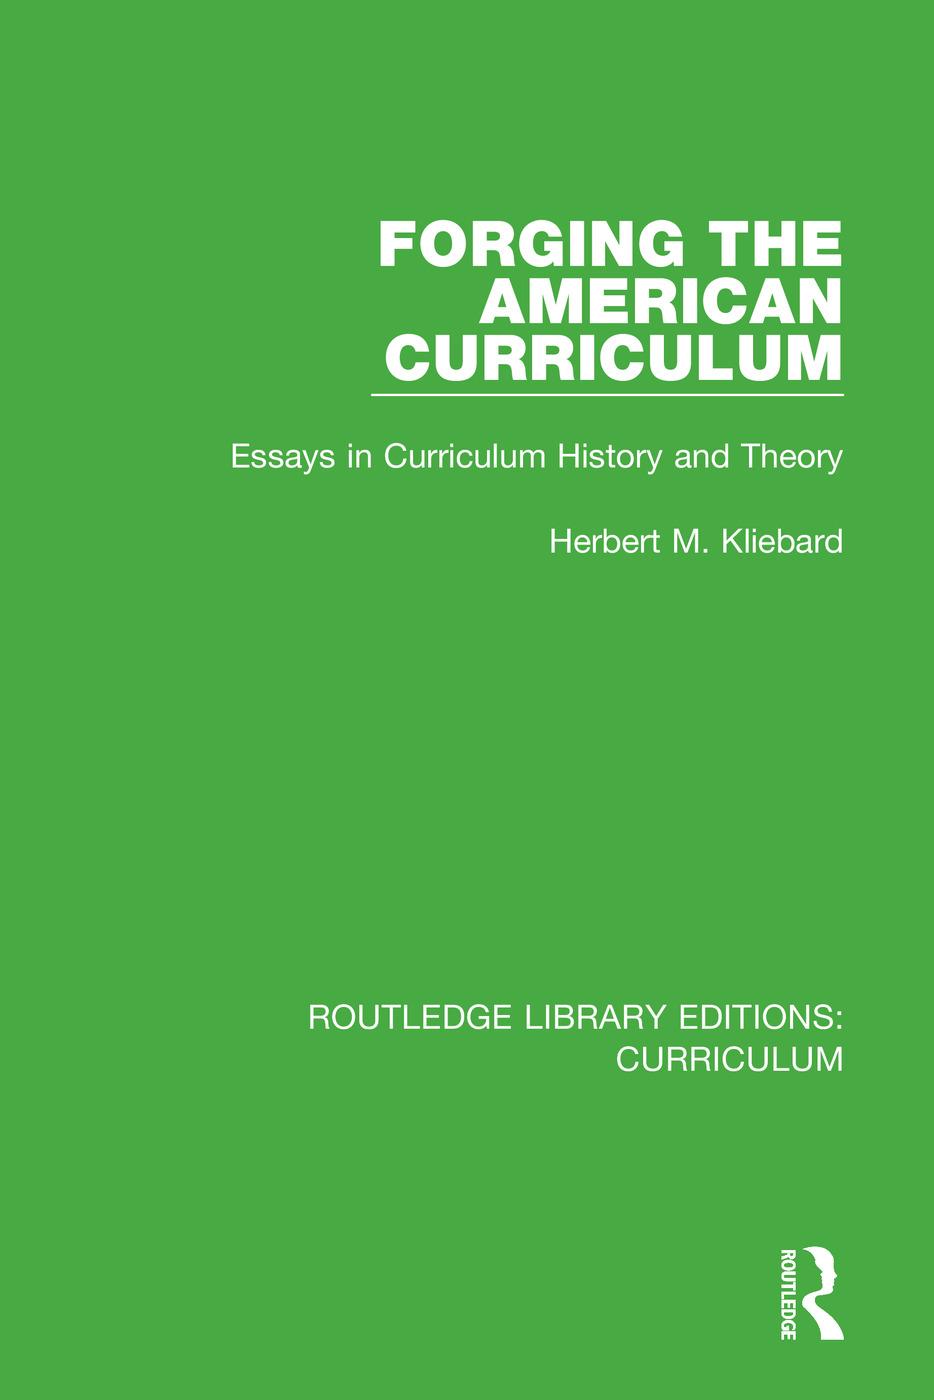 Forging the American Curriculum